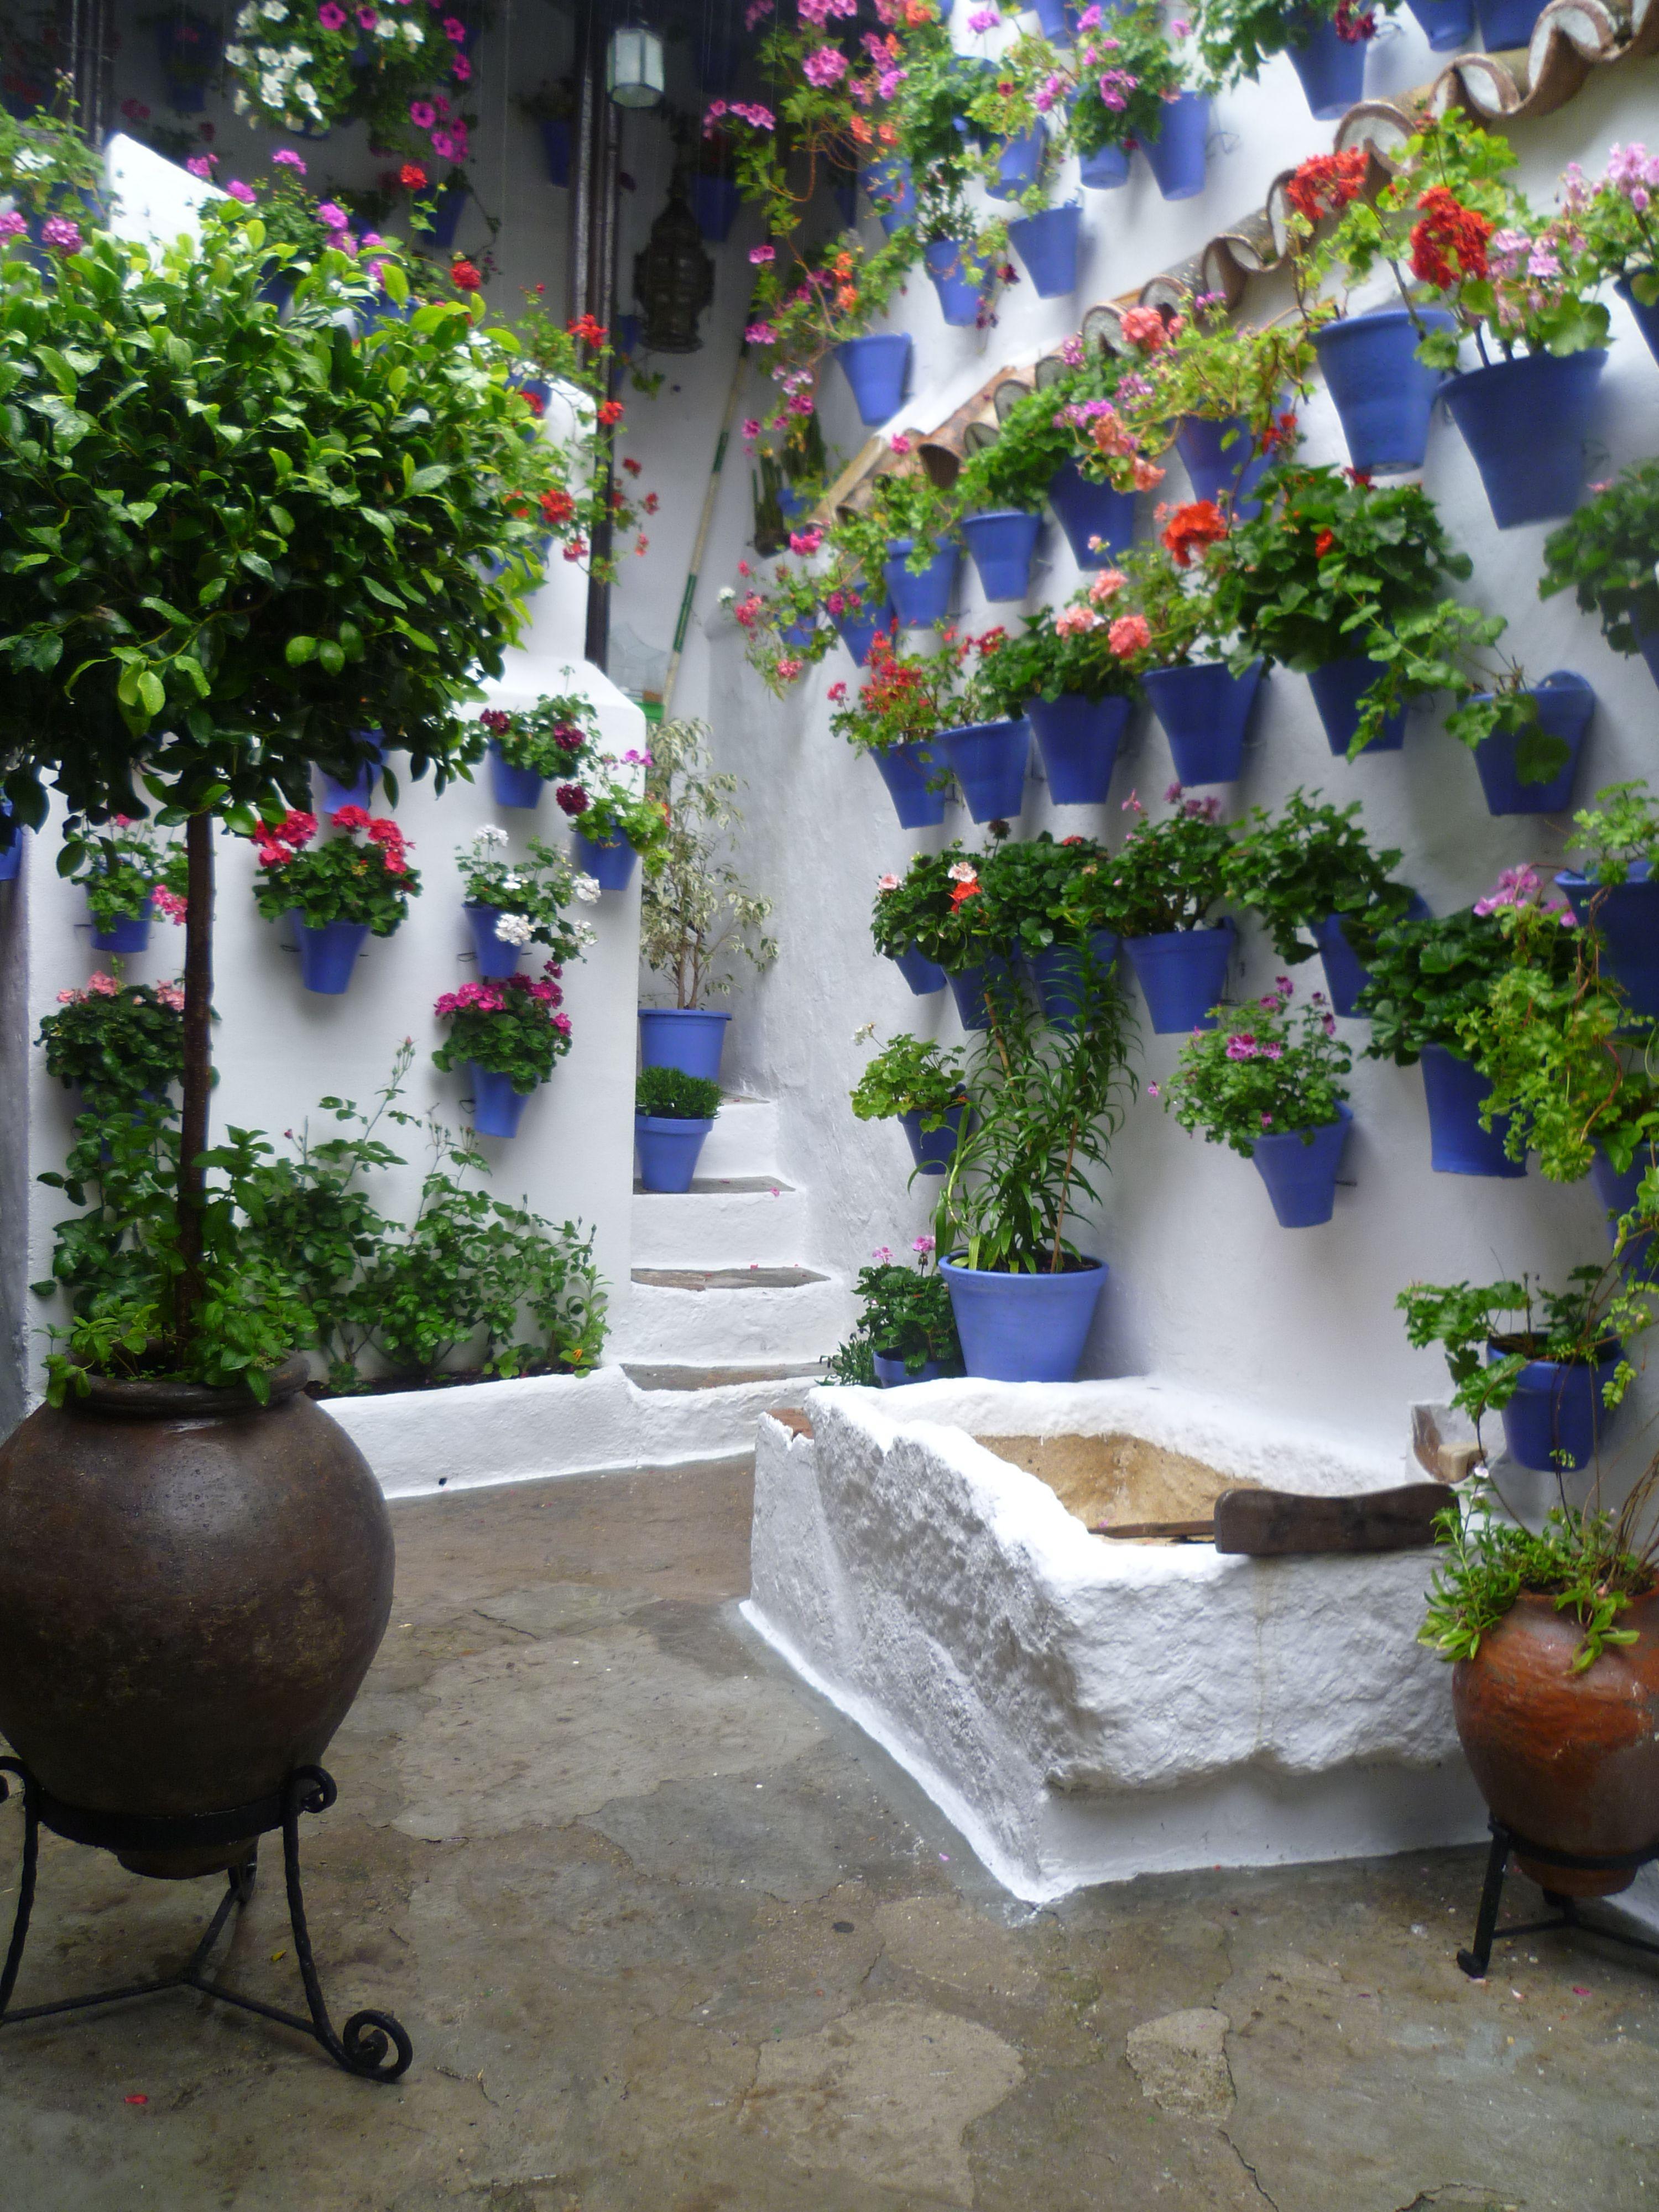 Los patios cordobeses patios andaluces espa a for Patios andaluces decoracion